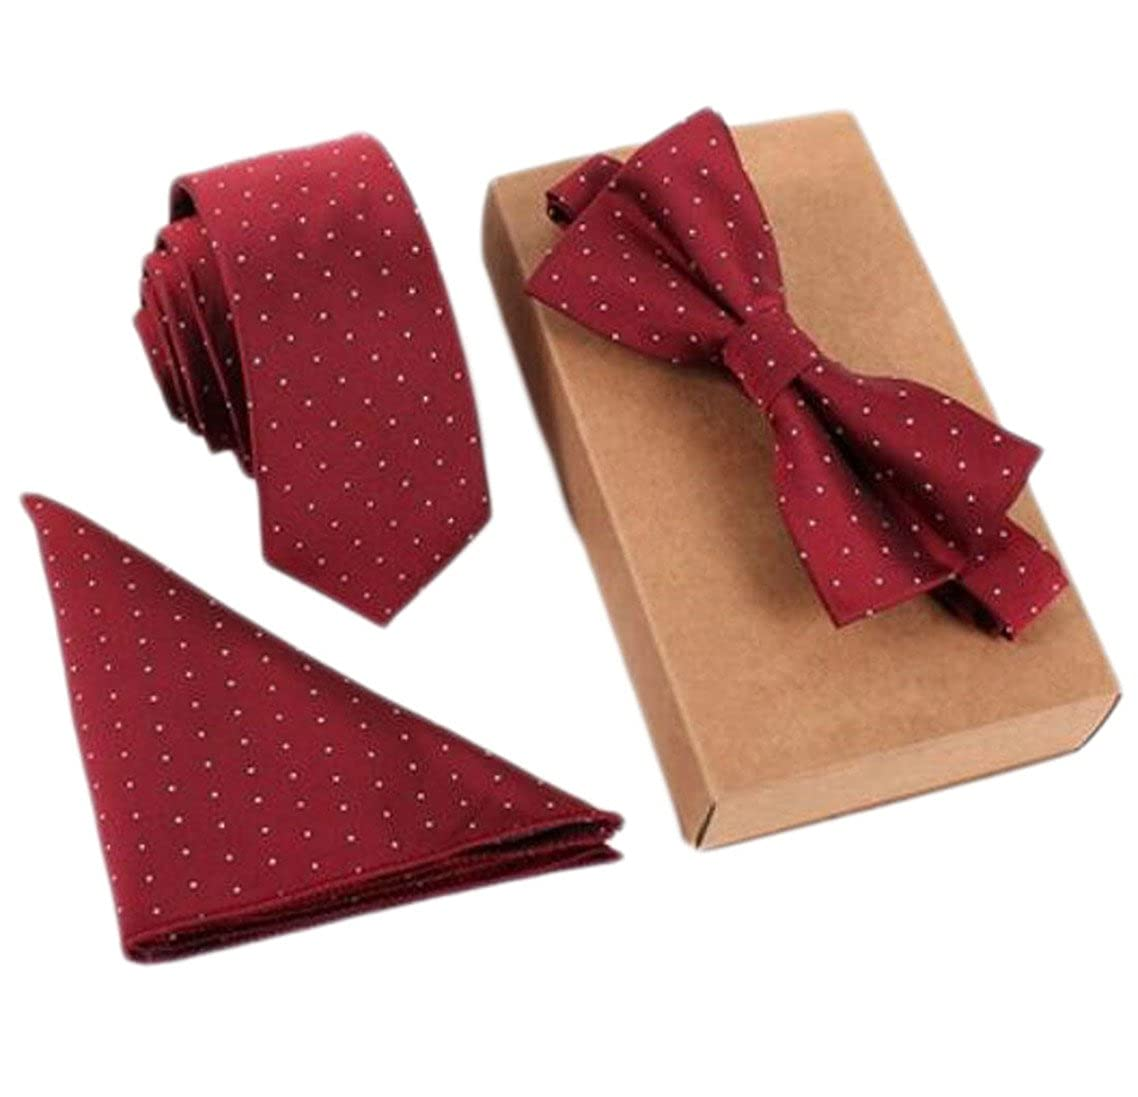 KXP Mens Regular-Fit Pattern Necktie Bow Tie Pocket Square Jacquard Set Red One-Size